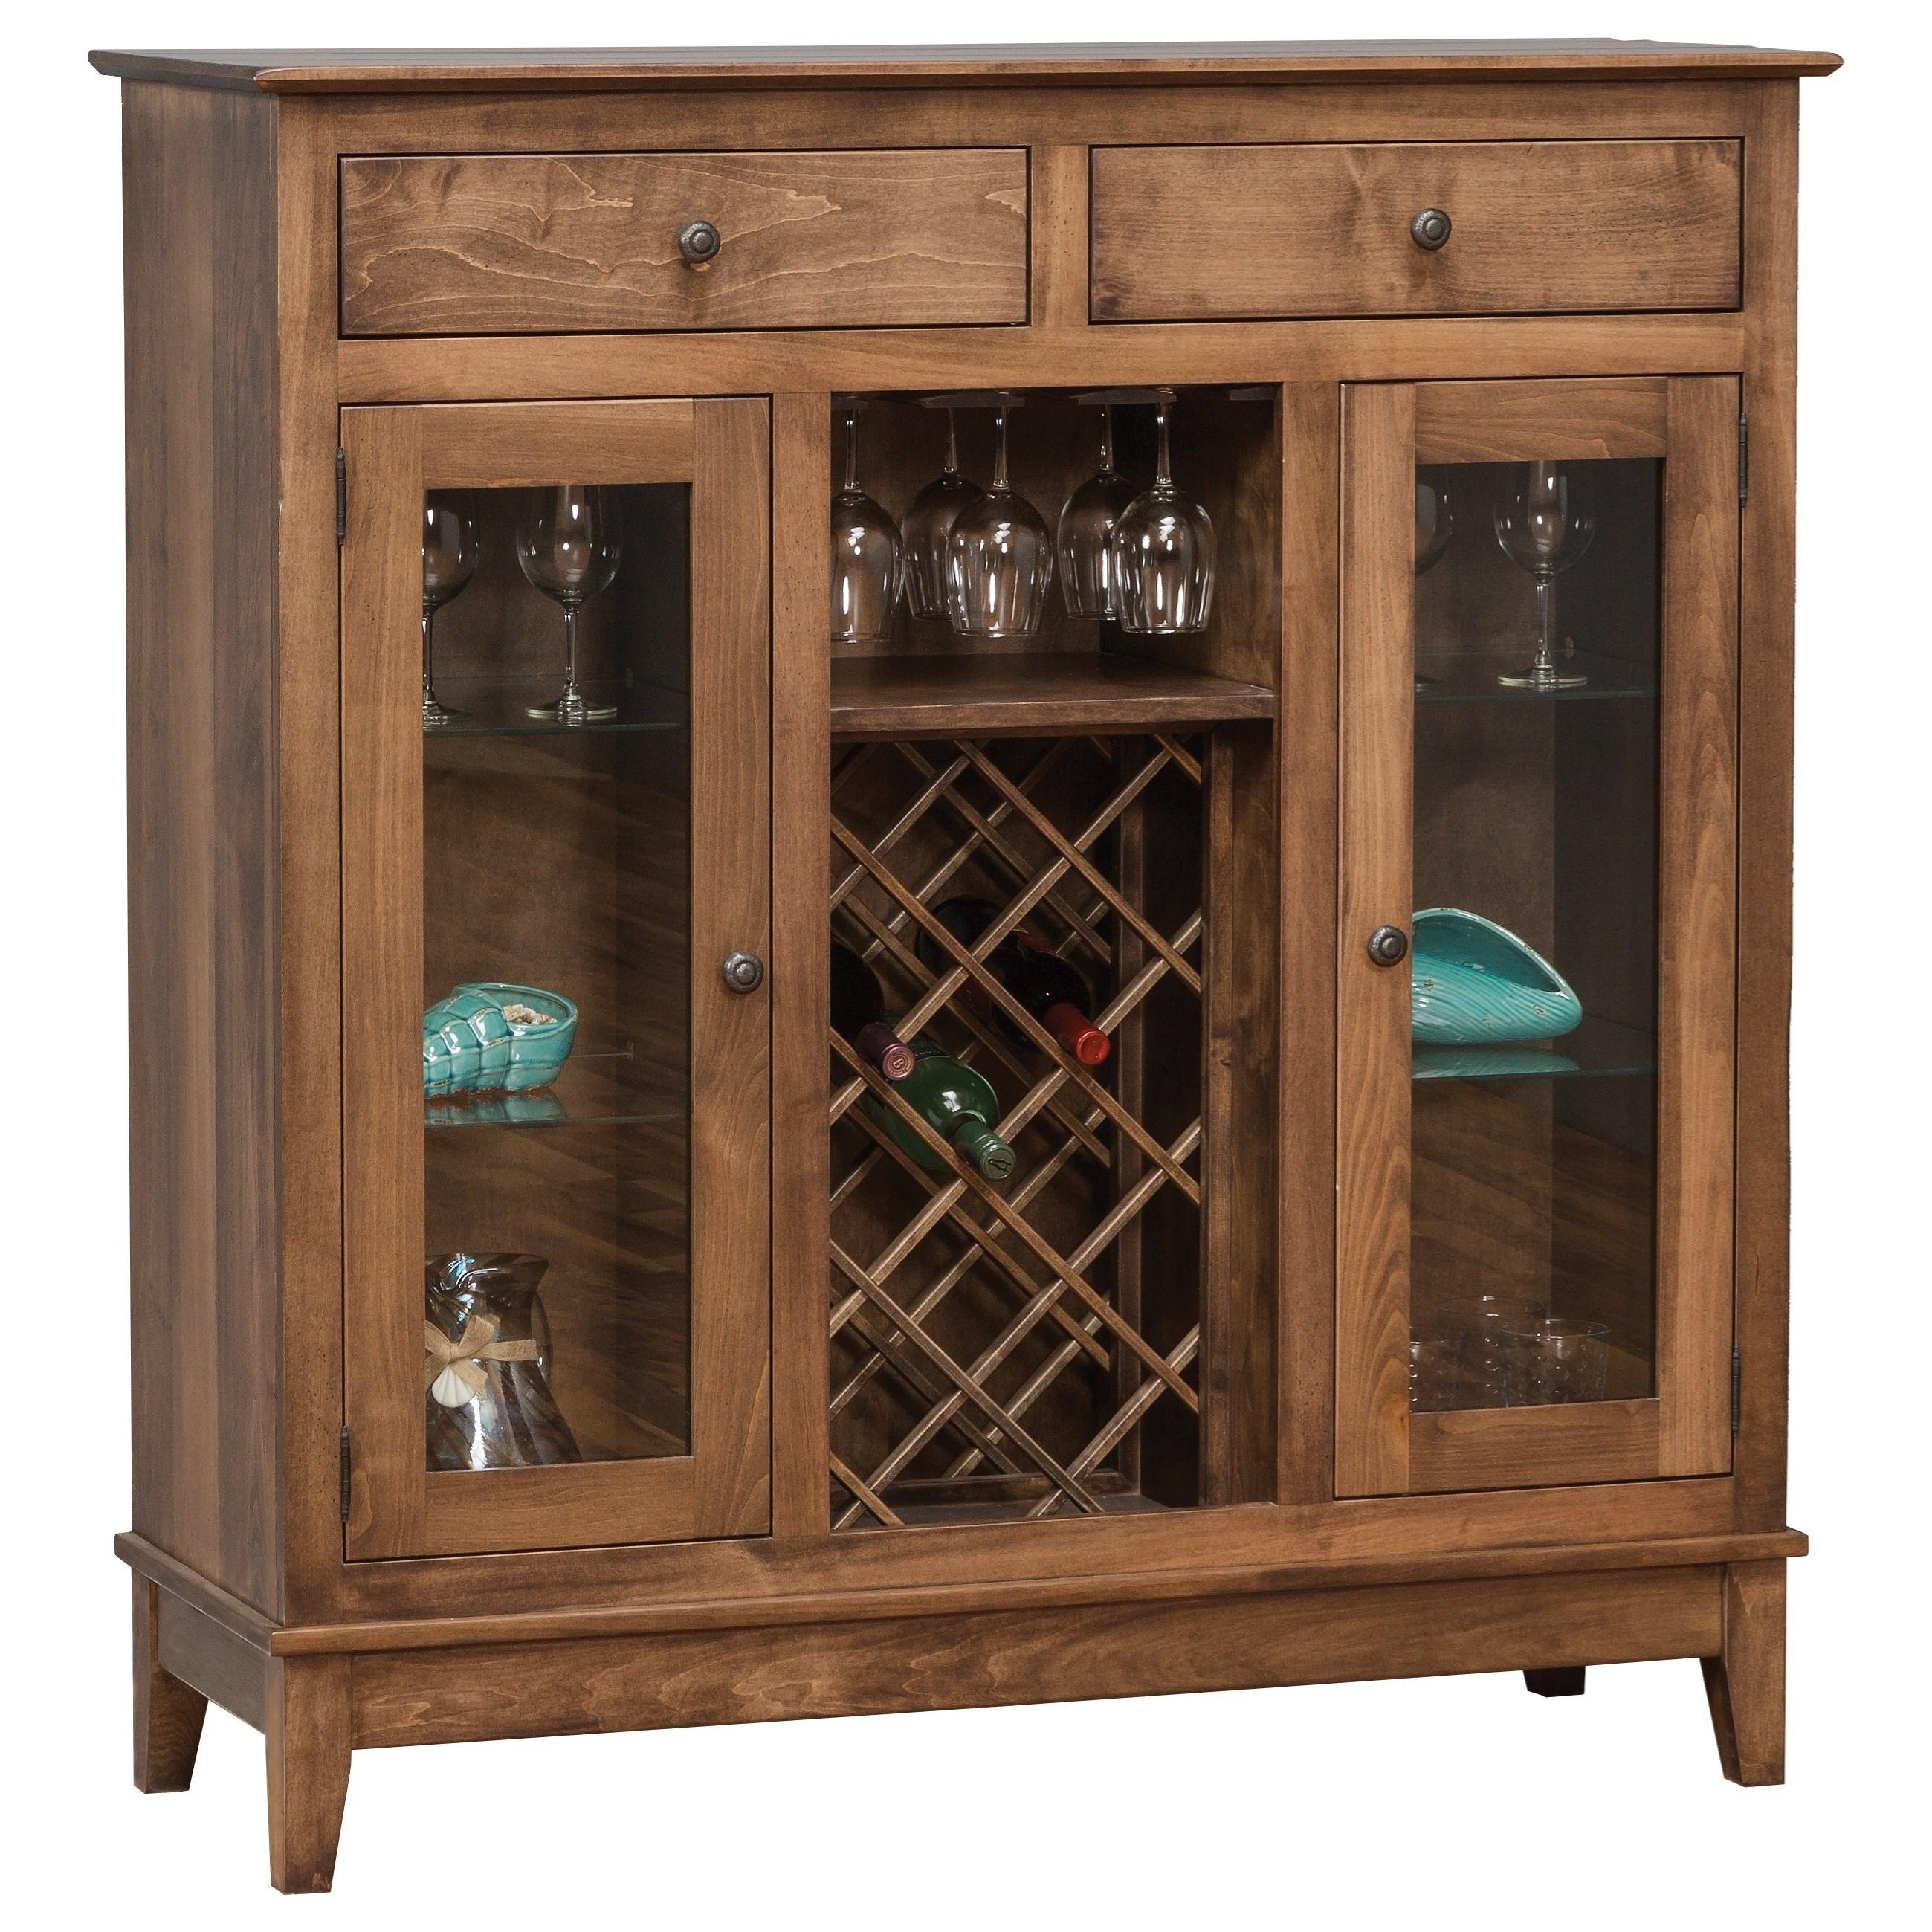 Daniels Amish Dining Storage 25 1822 Shaker Wine Cabinet